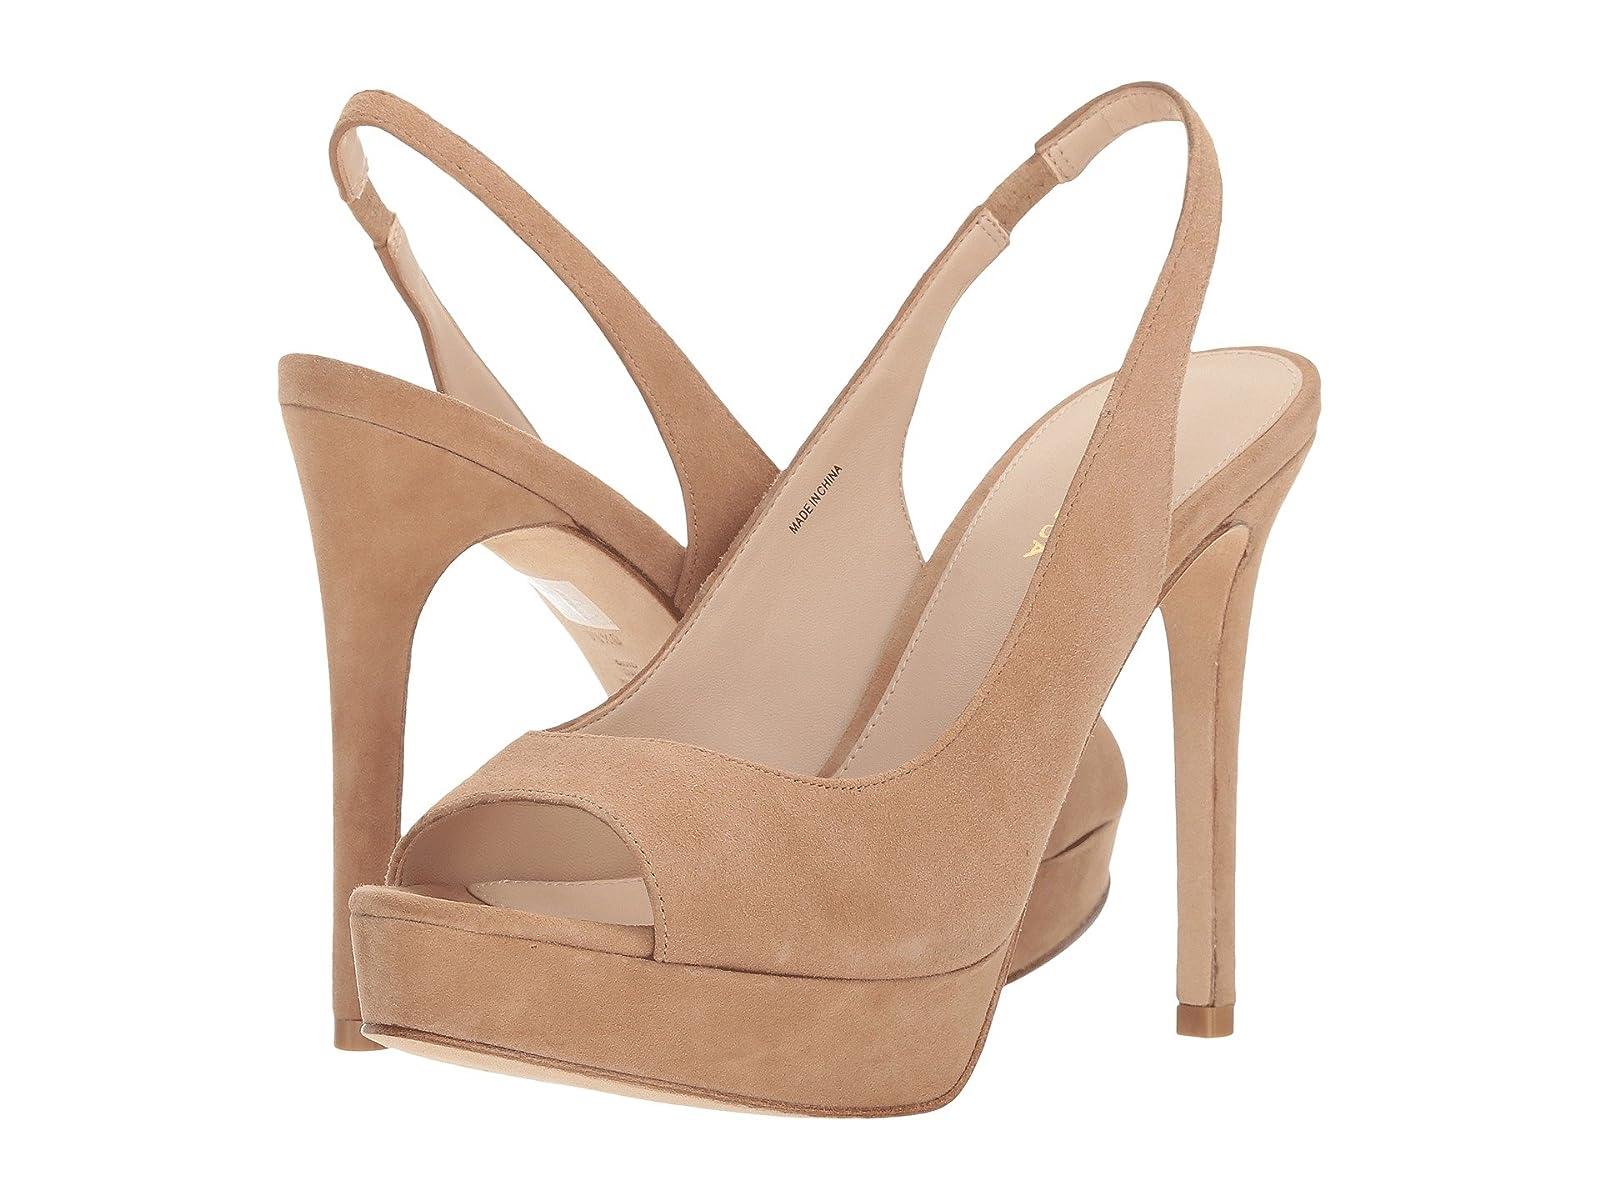 Pelle Moda OanaAtmospheric grades have affordable shoes